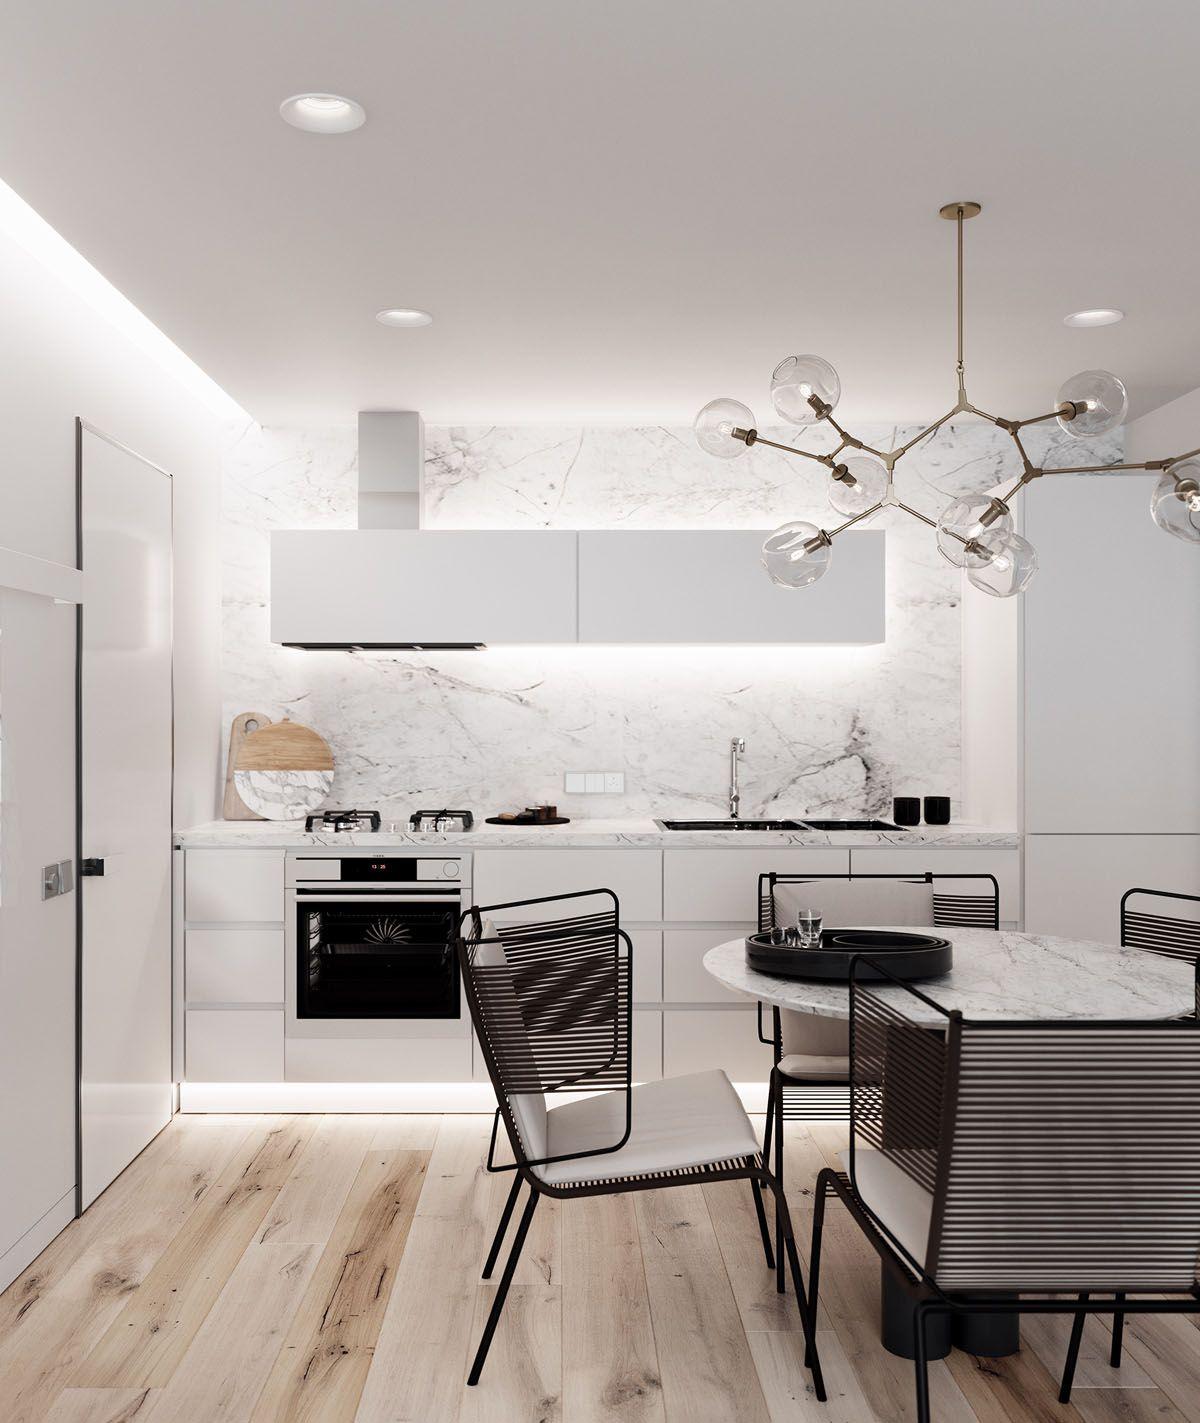 white-cabinetry-3.jpg 1,200×1,423 pixeles | Iluminación | Pinterest ...